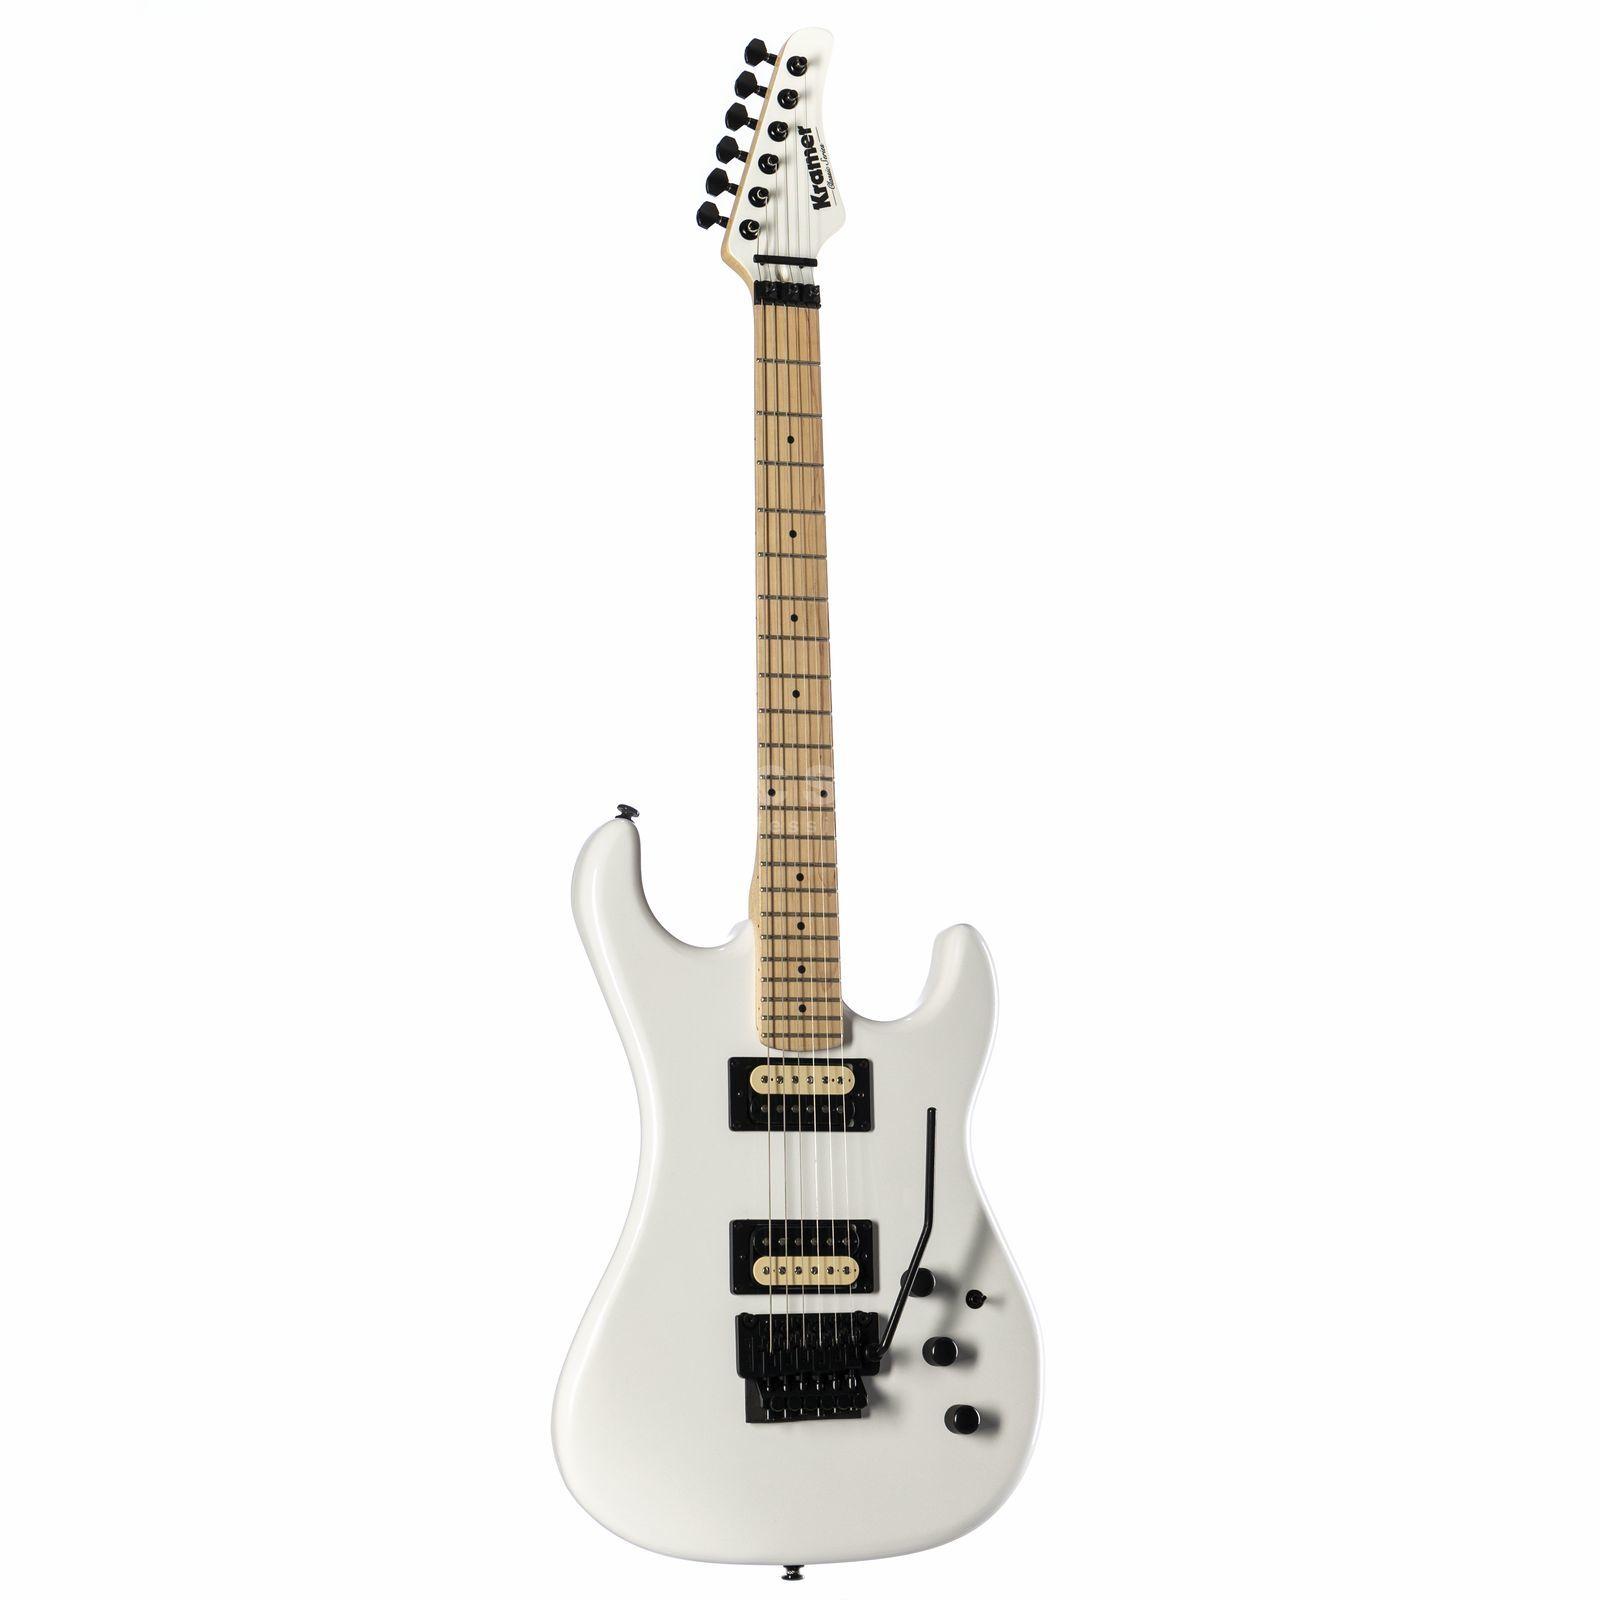 Kramer Pacer Classic : kramer guitars pacer classic pw pearl white dv247 ~ Hamham.info Haus und Dekorationen